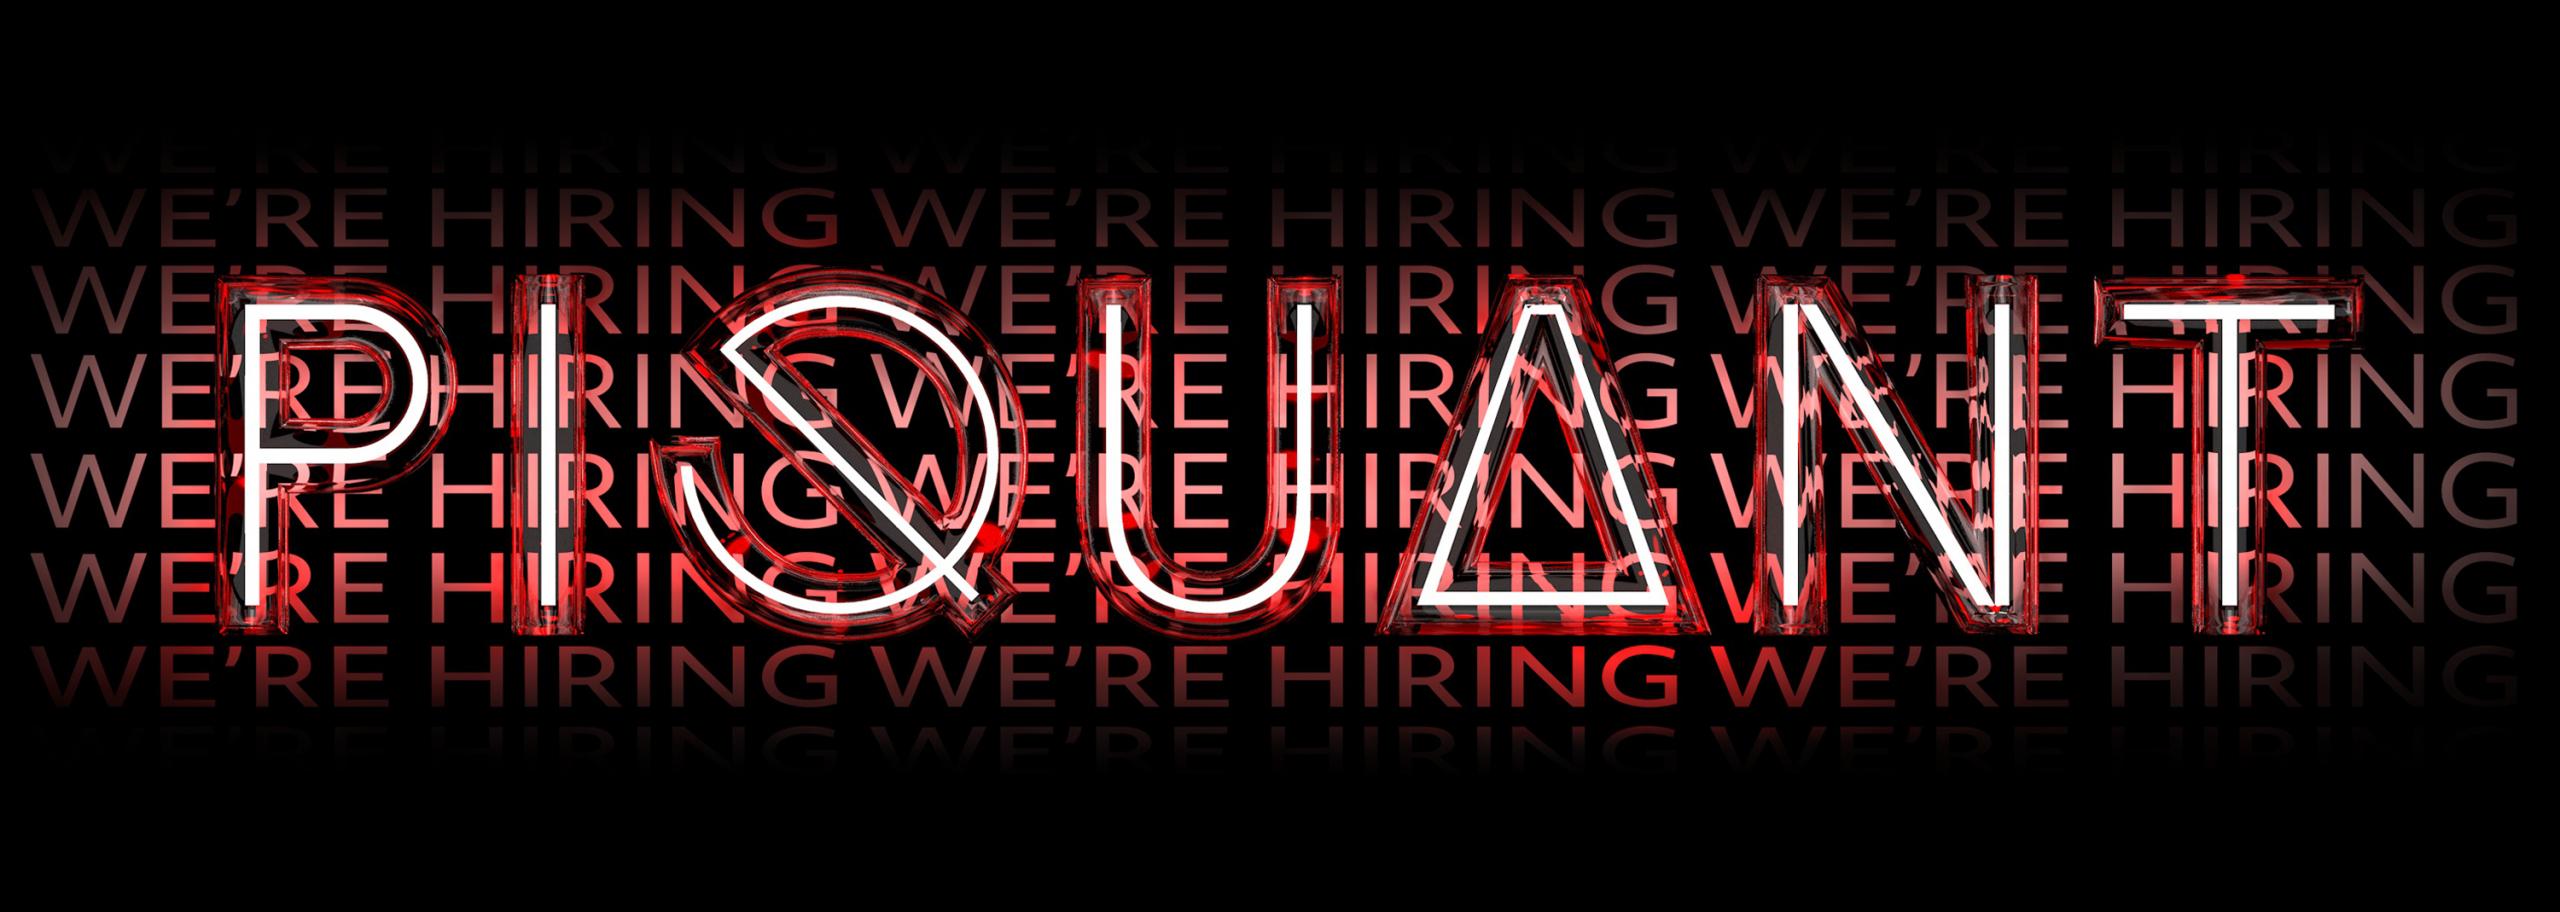 Piquant hiring a digital designer and procurement administrator - header image